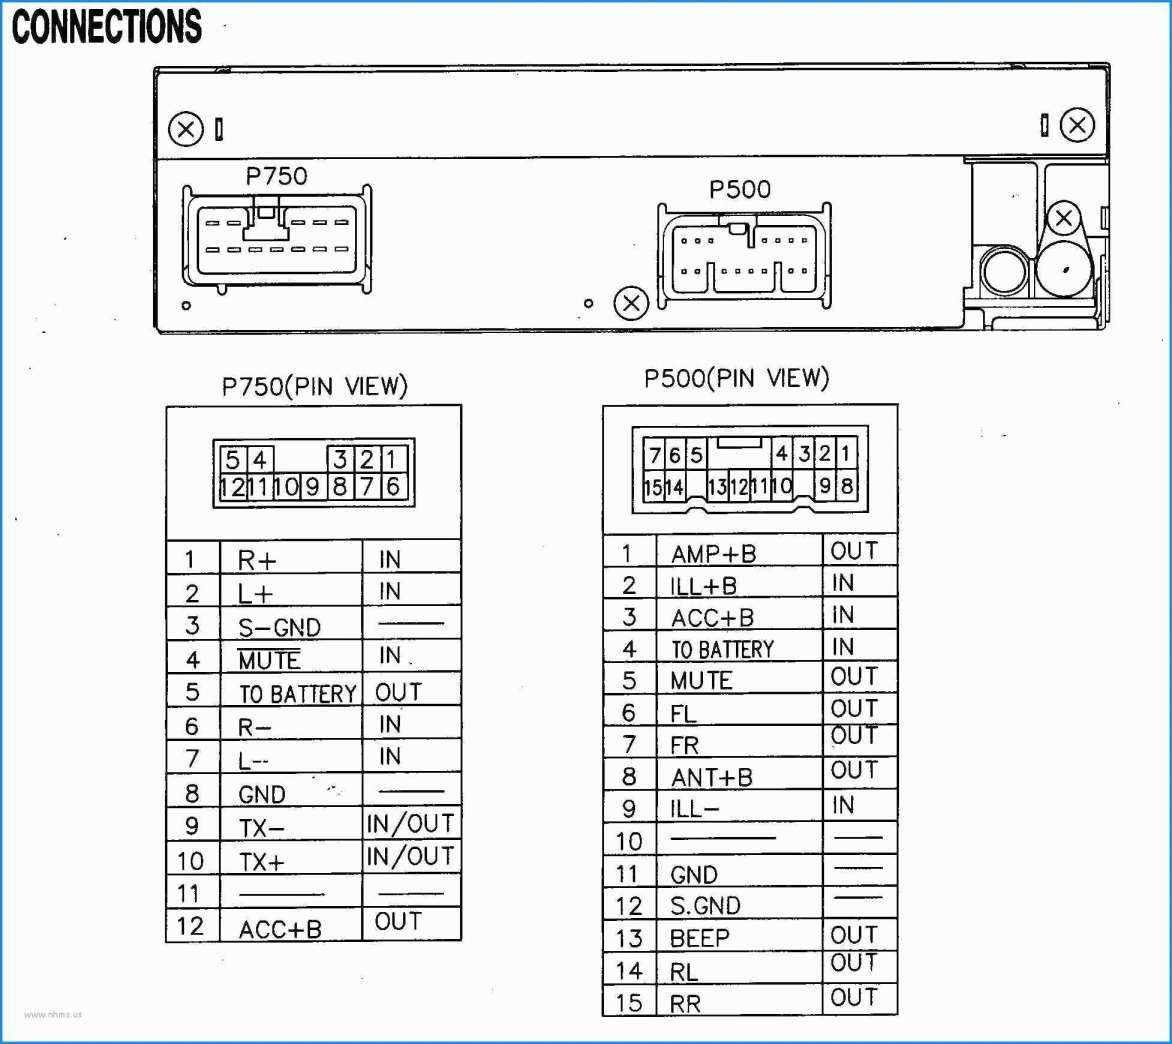 [DIAGRAM_34OR]  Pin on Subwoofer wiring | Kenwood Radio Wiring Schematic |  | www.pinterest.ph